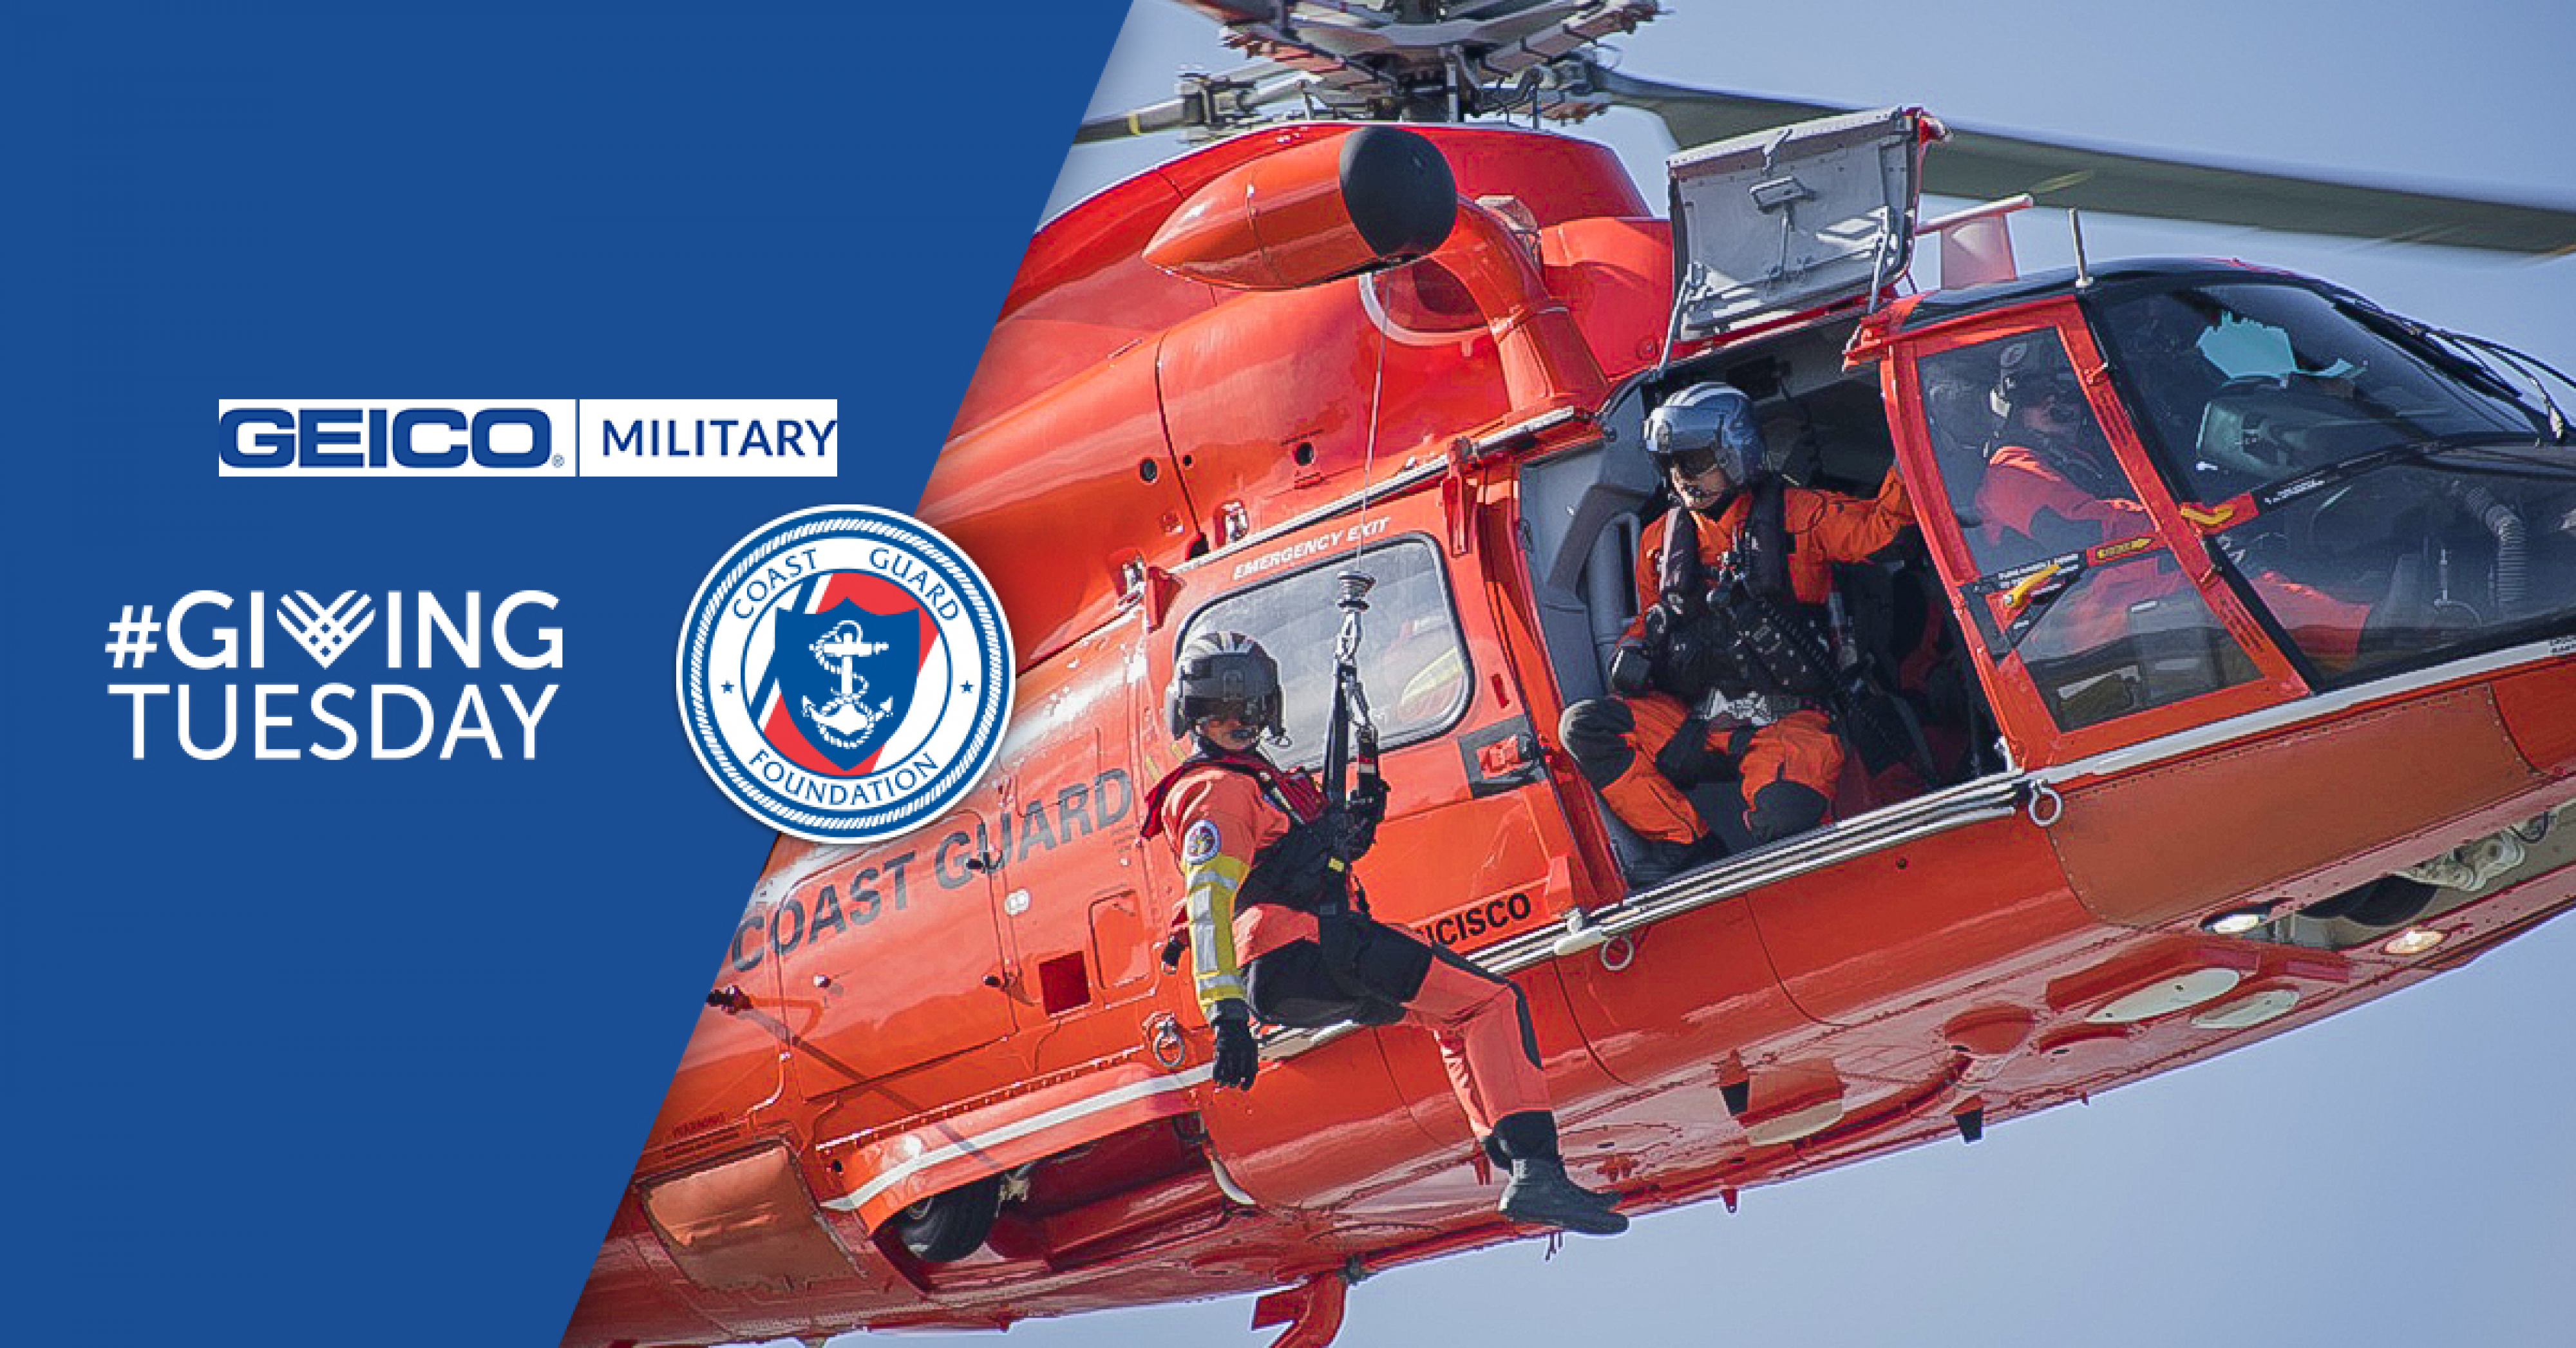 Giving Tuesday | Coast Guard Foundation